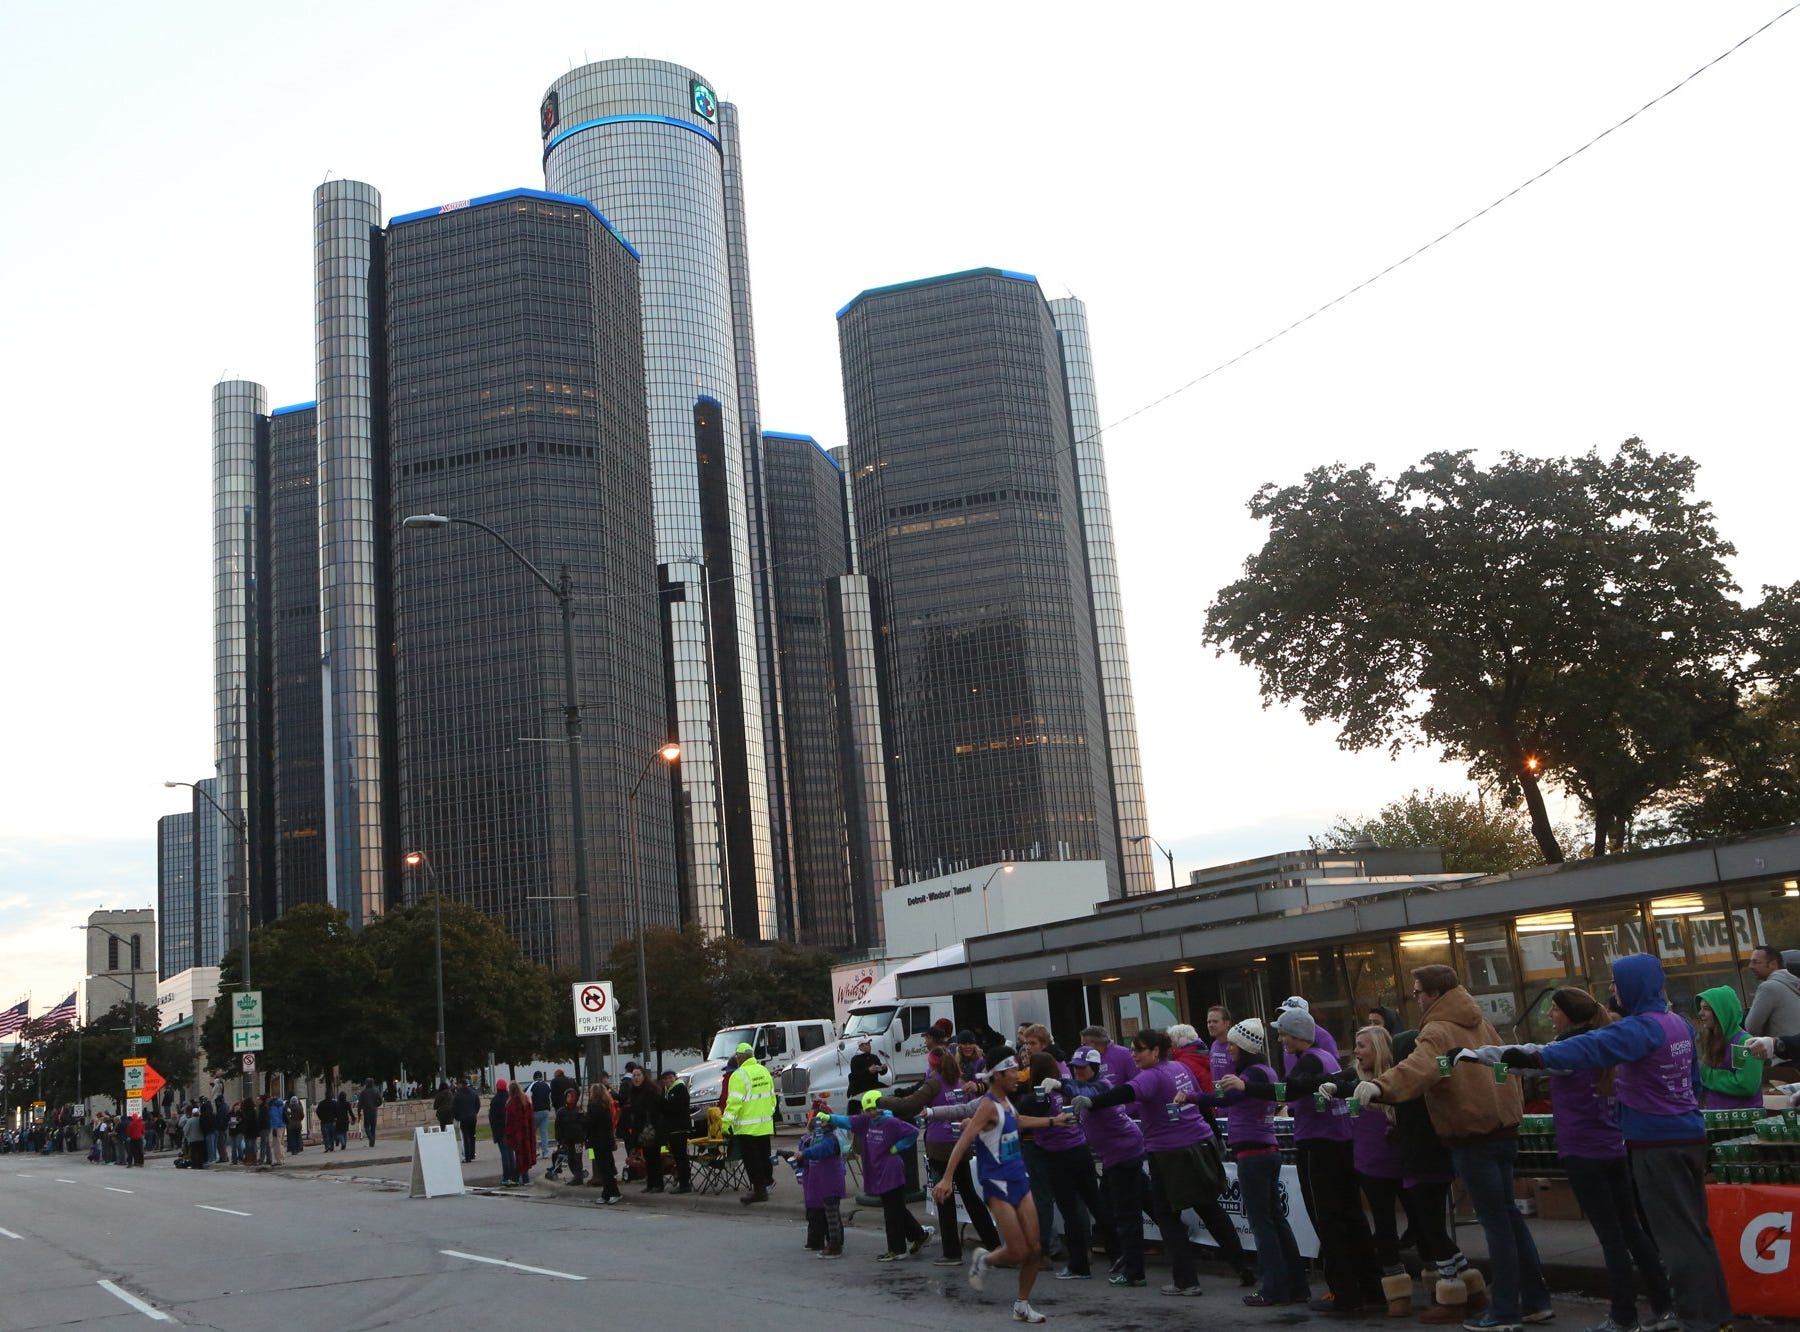 The 36th annual Detroit Free Press/Talmer Bank Marathon on Sunday, Oct. 20, 2013.